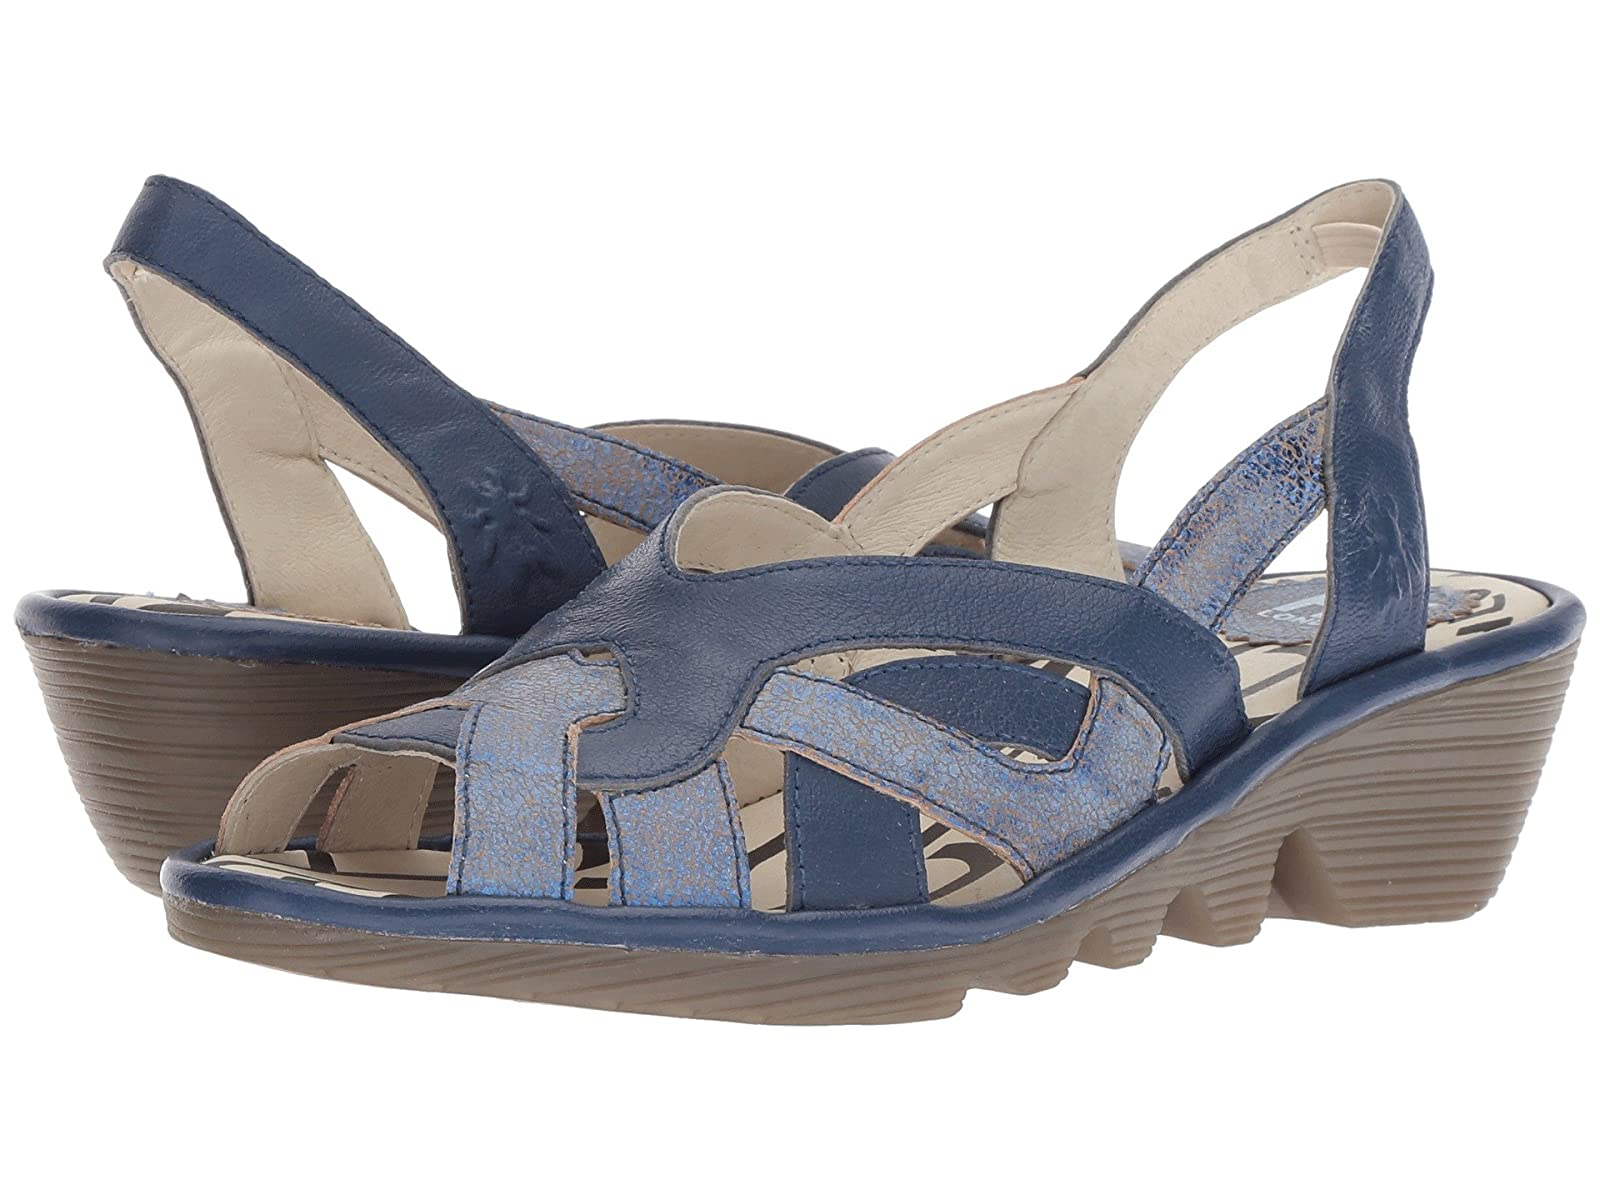 FLY LONDON PIMA887FLYAtmospheric grades have affordable shoes